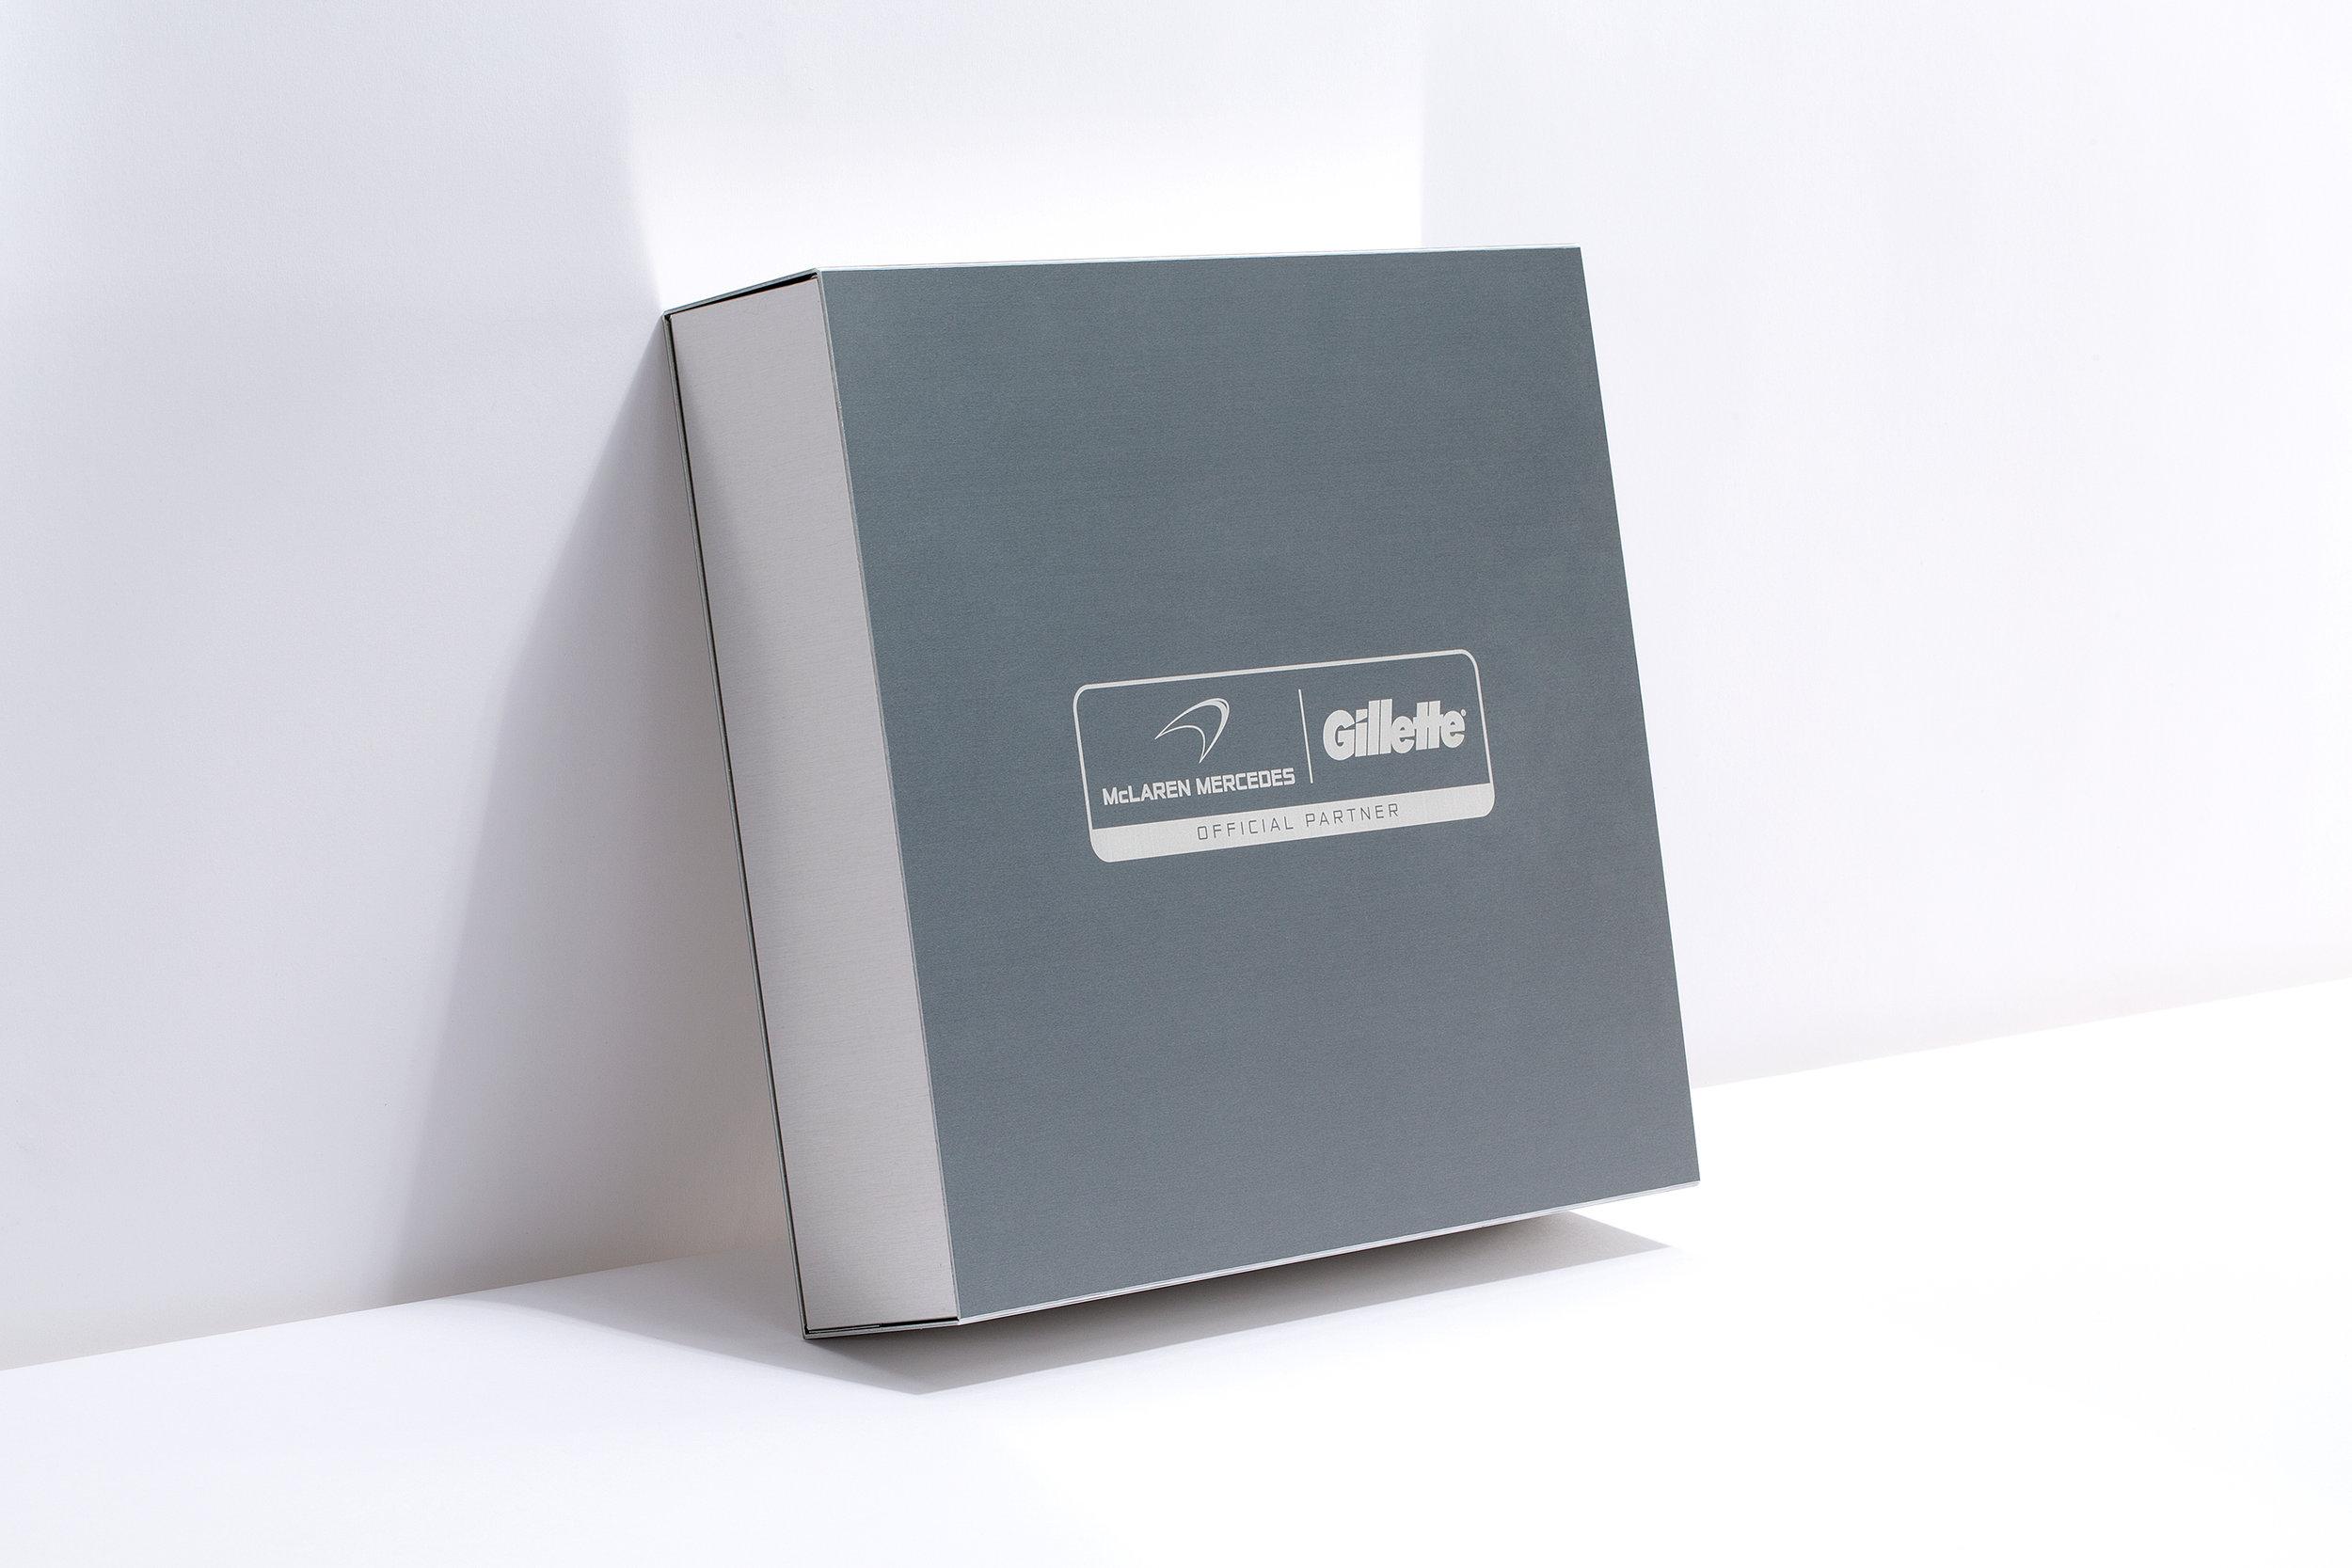 Gillette_M_B09C4278_3000x2000.jpg